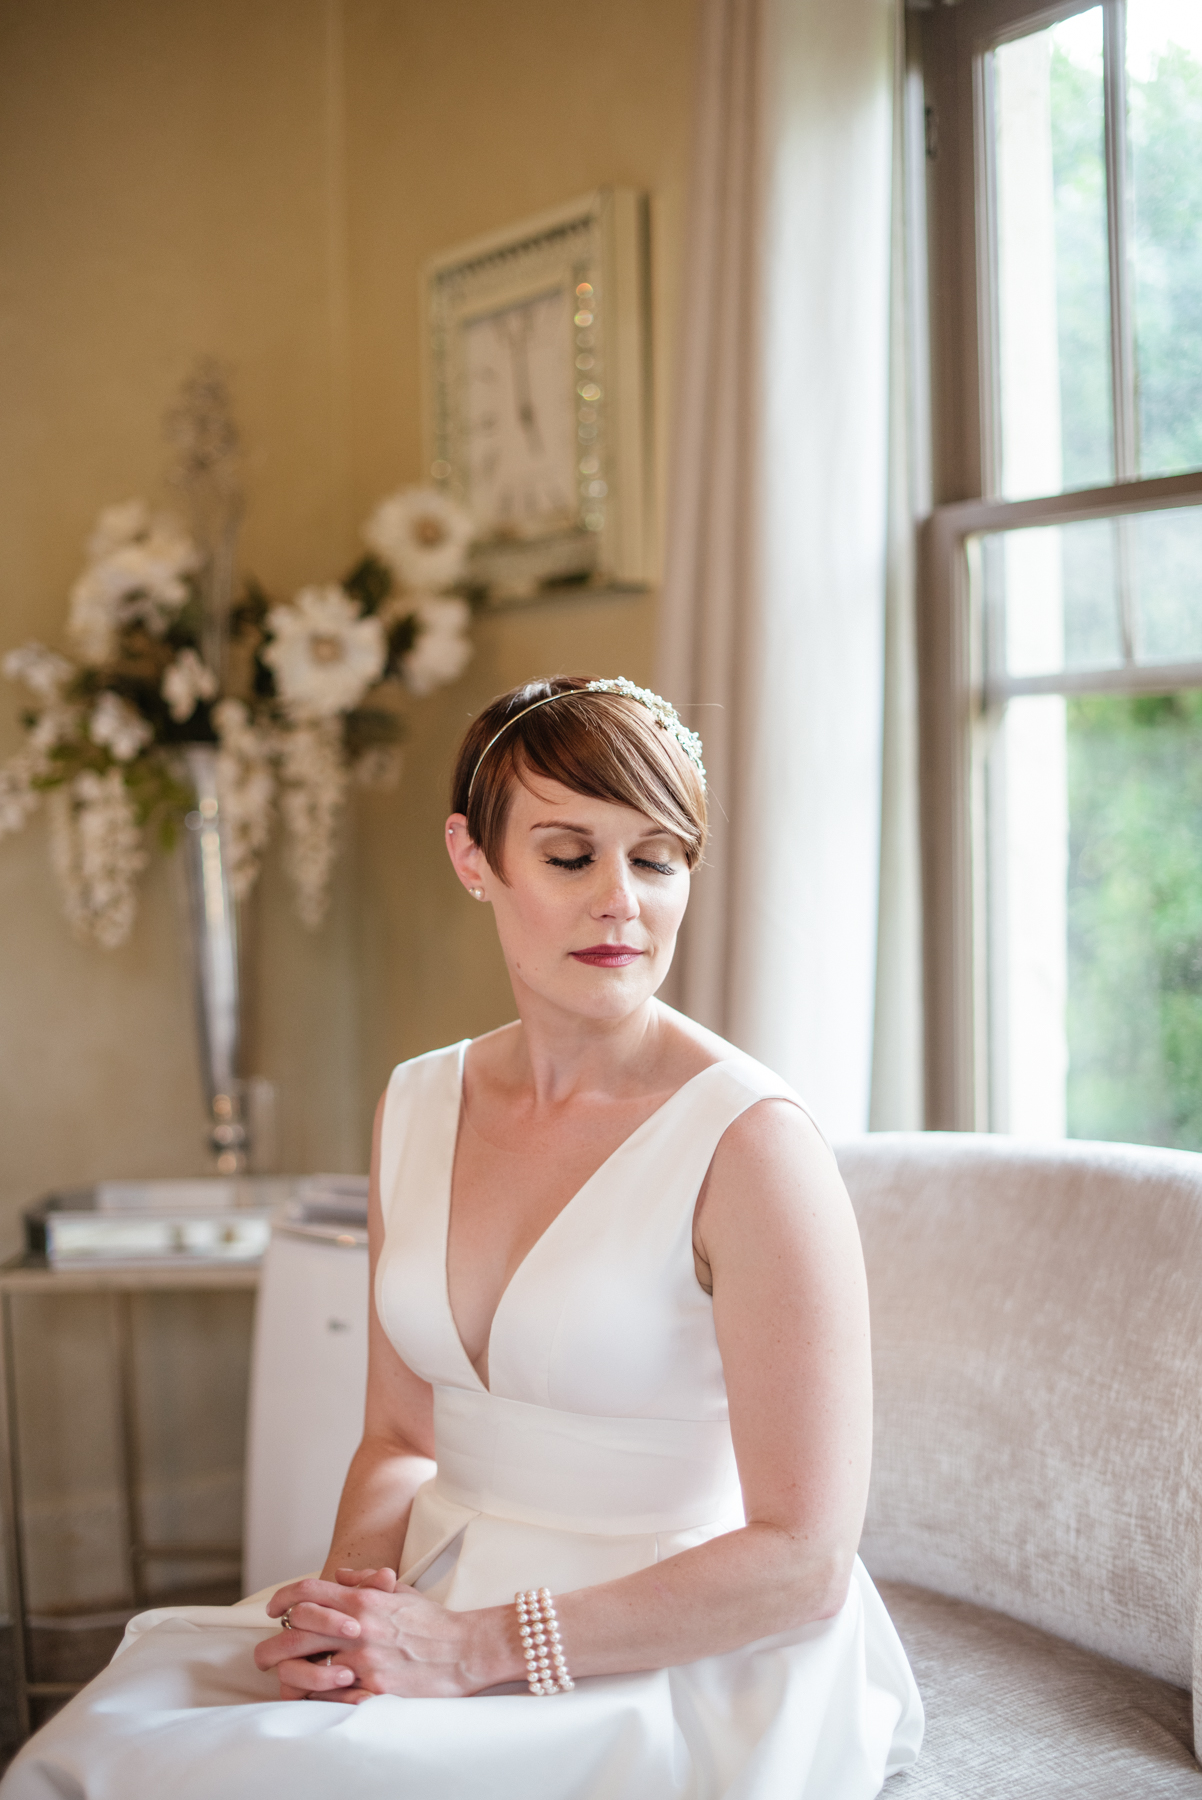 Secret Garden Event Center Wedding - Meredith Amadee Photography-20-2.jpg